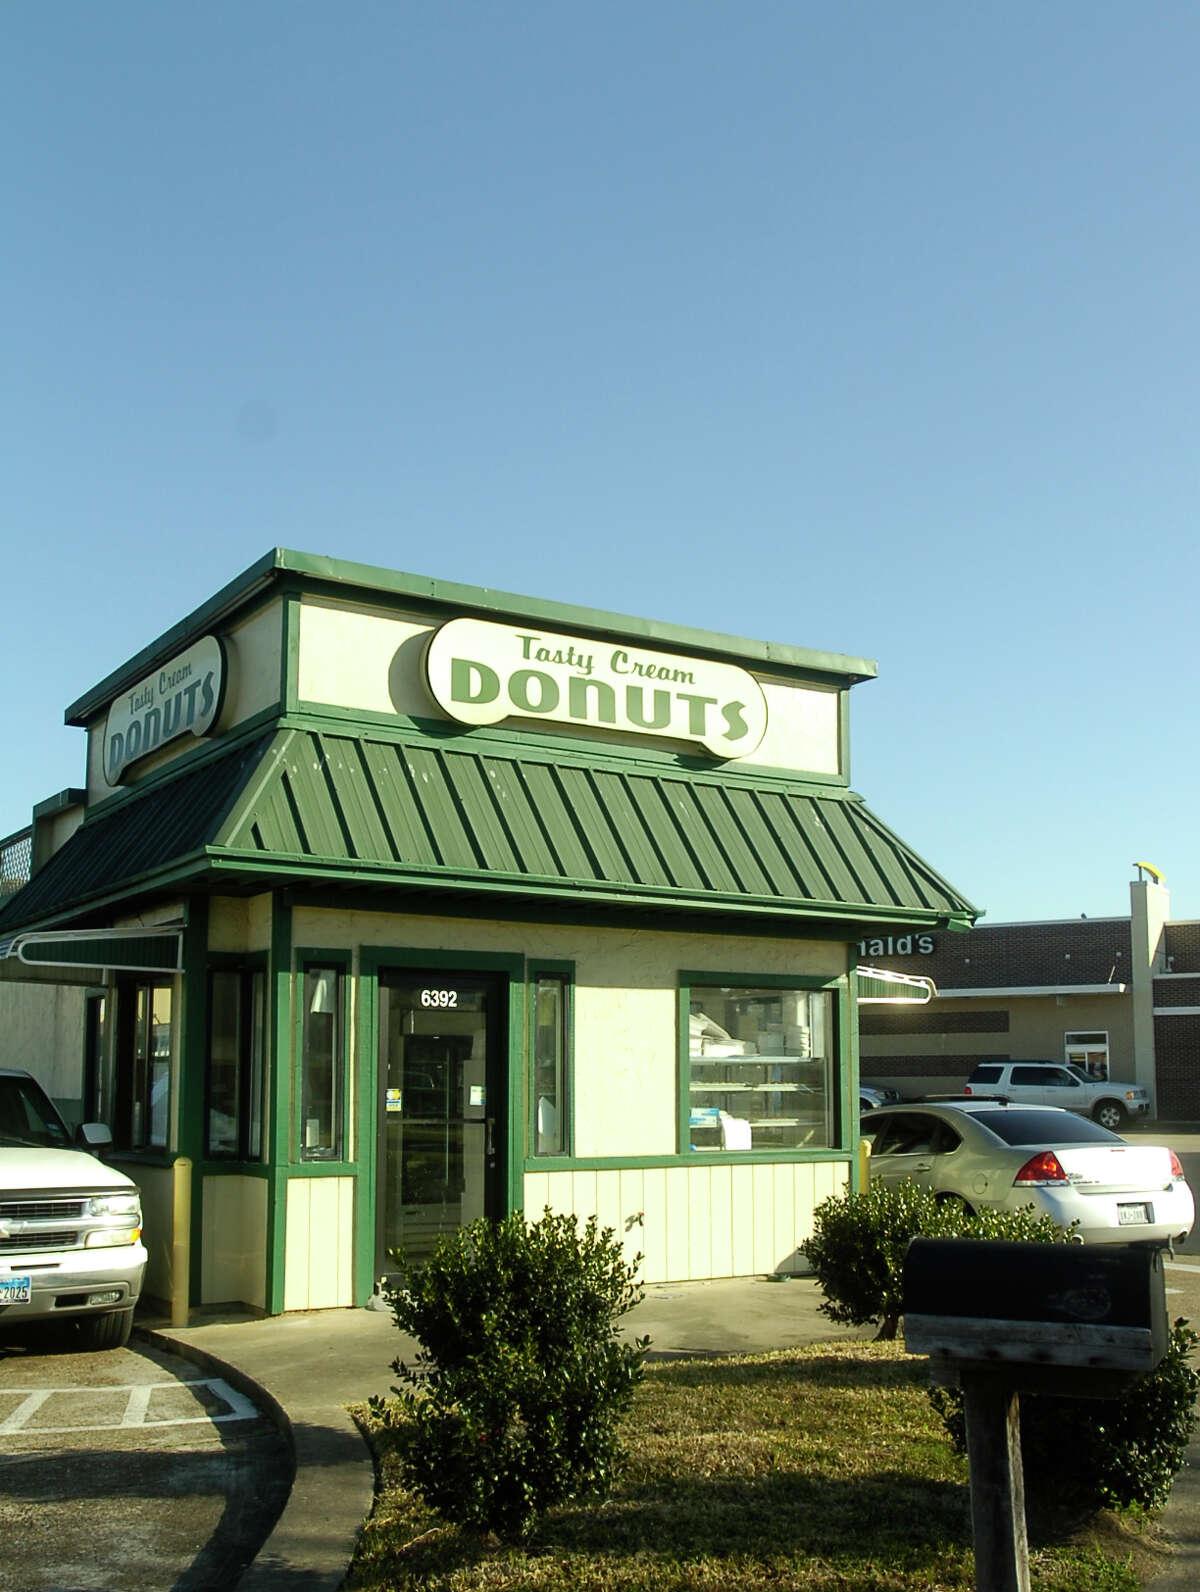 TASTY CREAM DONUTS Where: 7495 Phelan Blvd., Beaumont Anticipated opening: